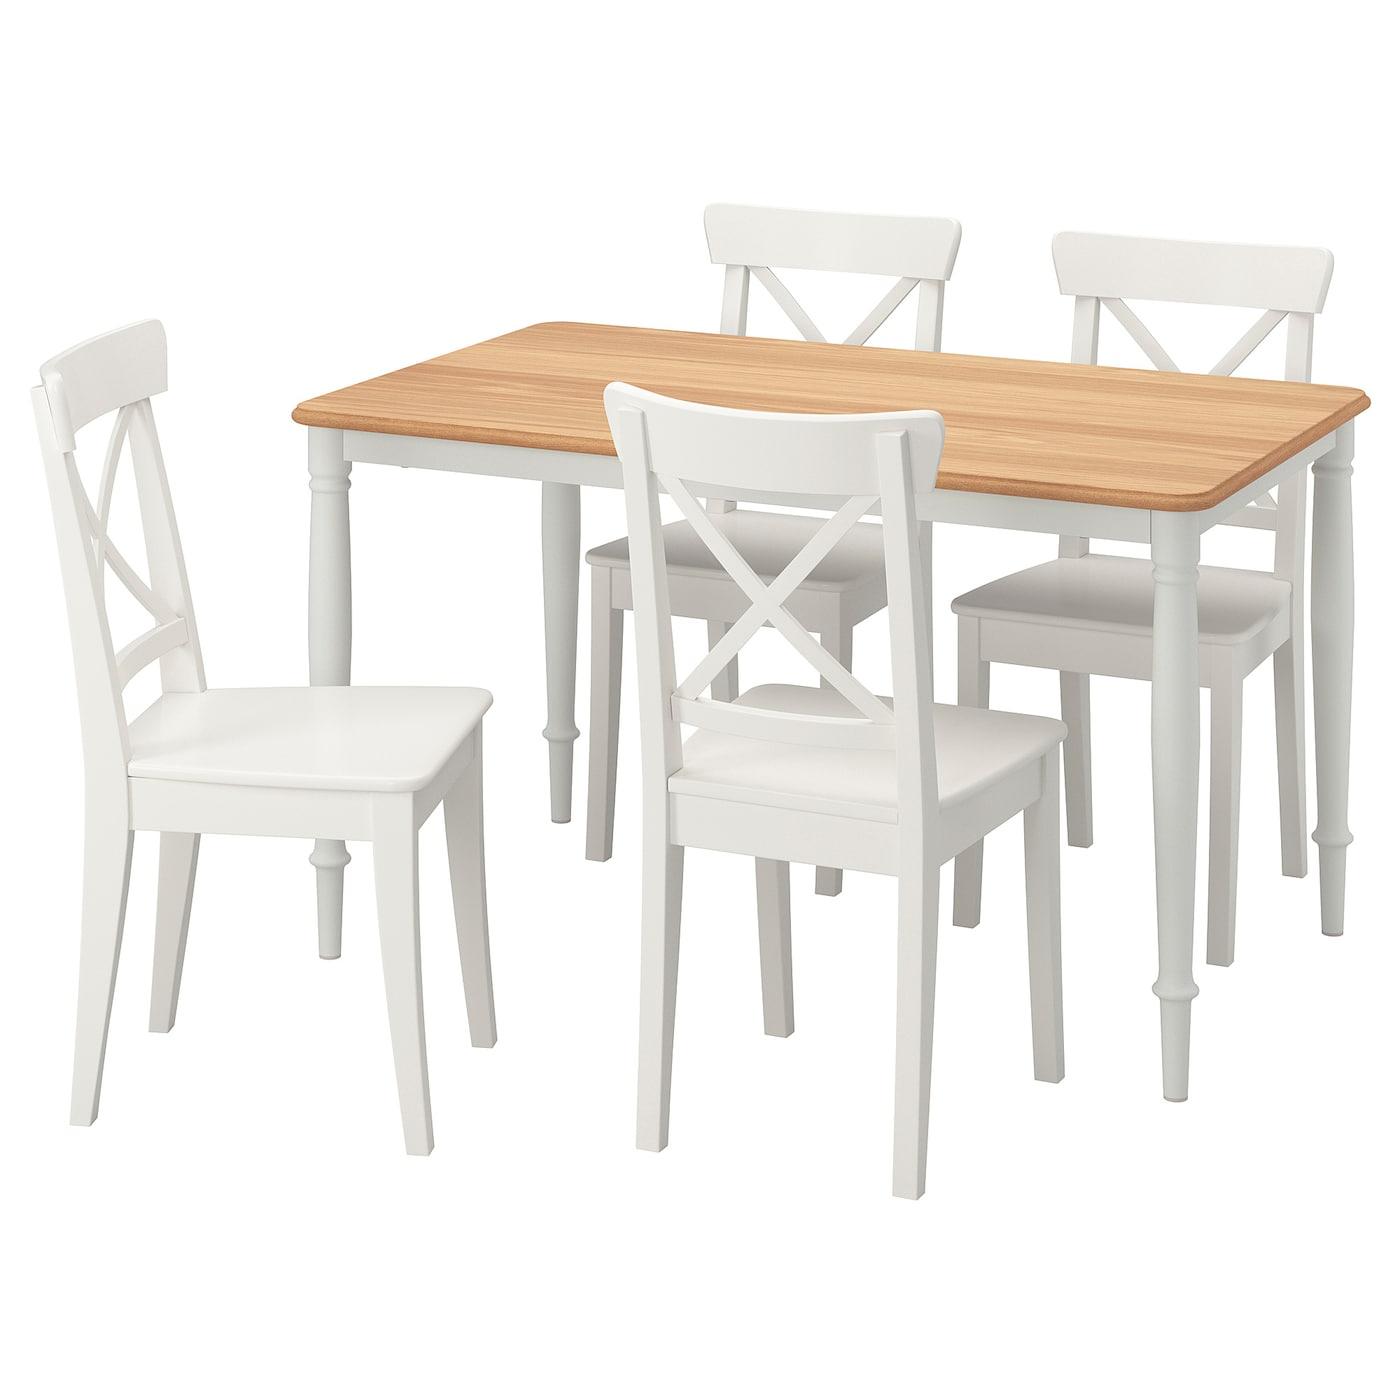 DANDERYD / INGOLF Table and 9 chairs   oak veneer white/white 9x9 cm